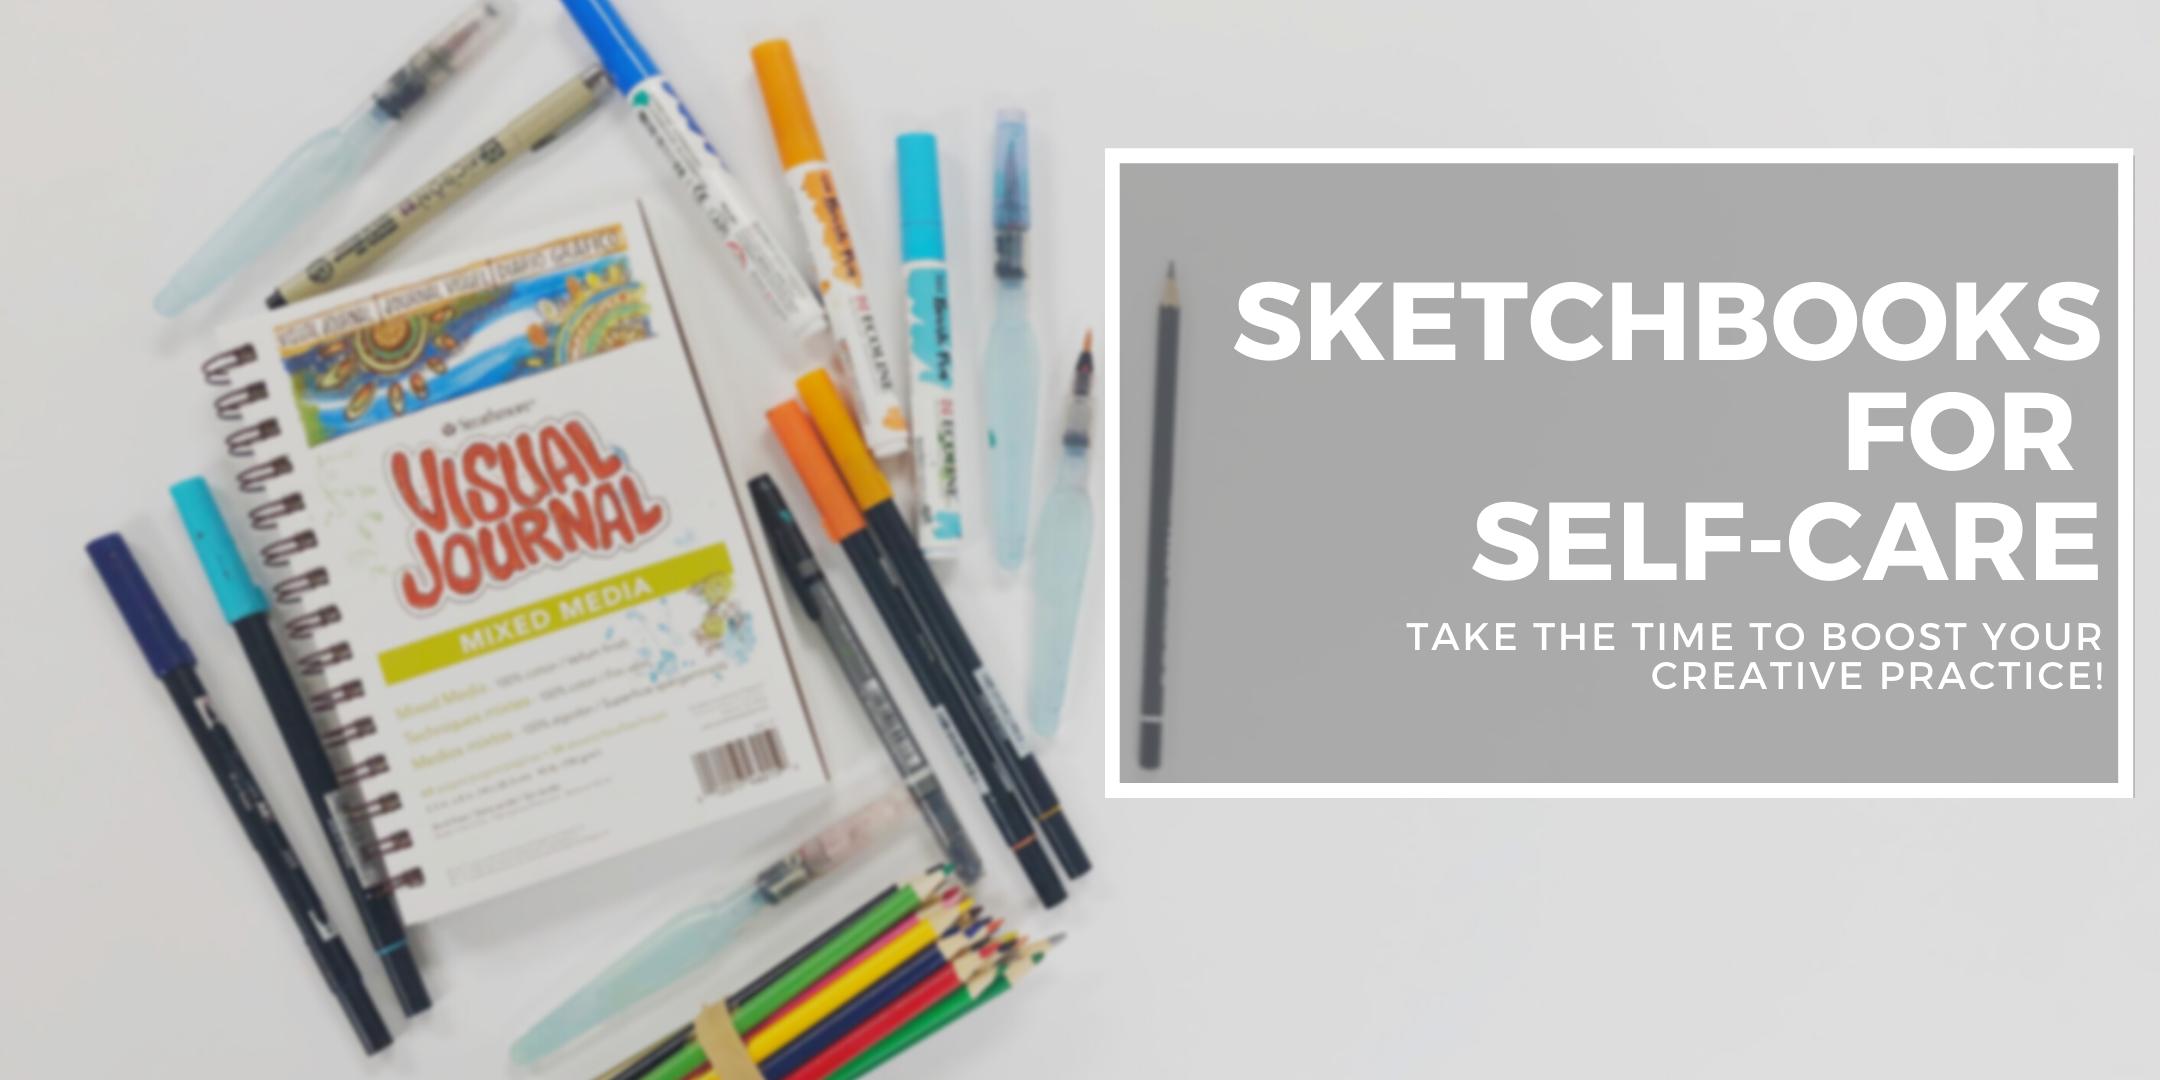 Sketchbooks for Self-Care